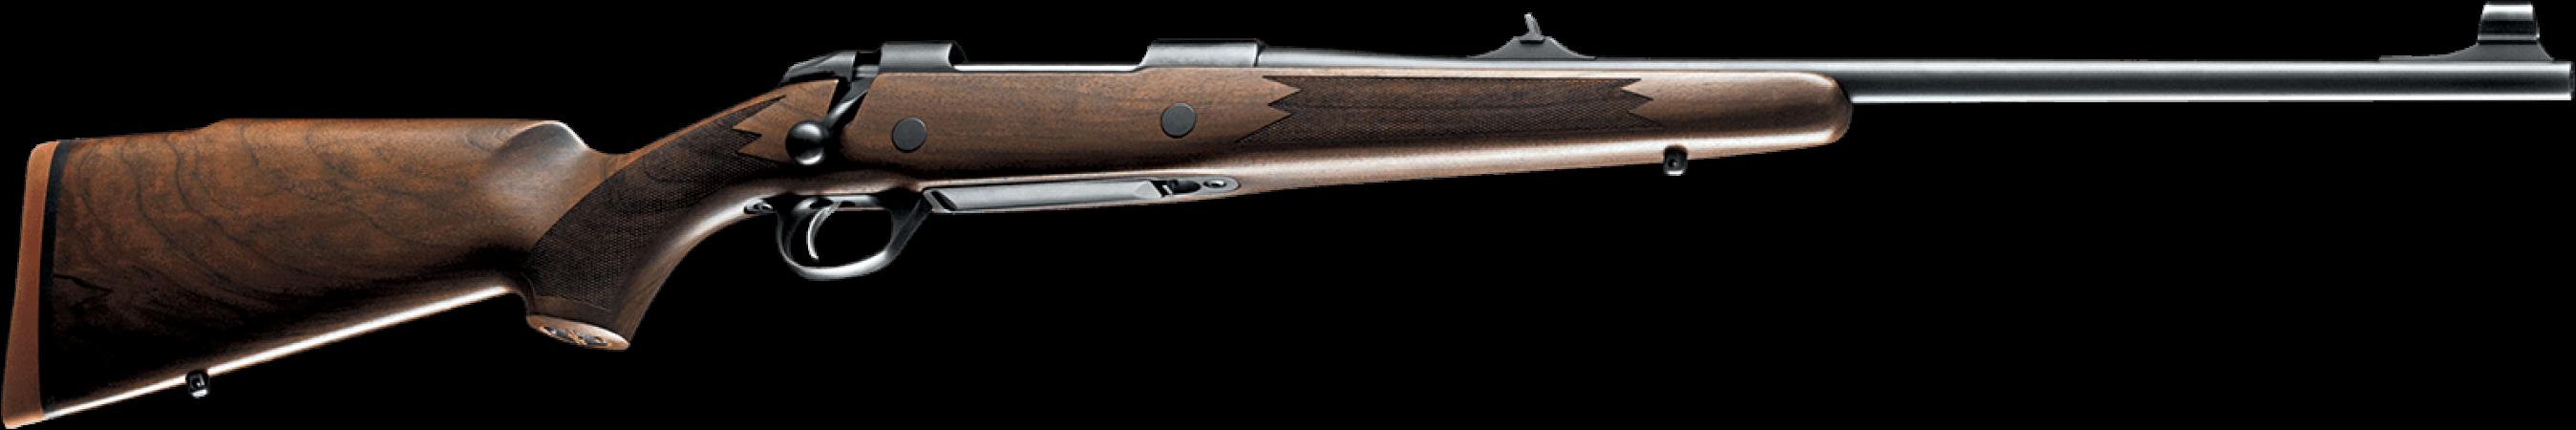 Карабин Sako 85 Hunter, кал. 8x57 IS (со шнеллером)